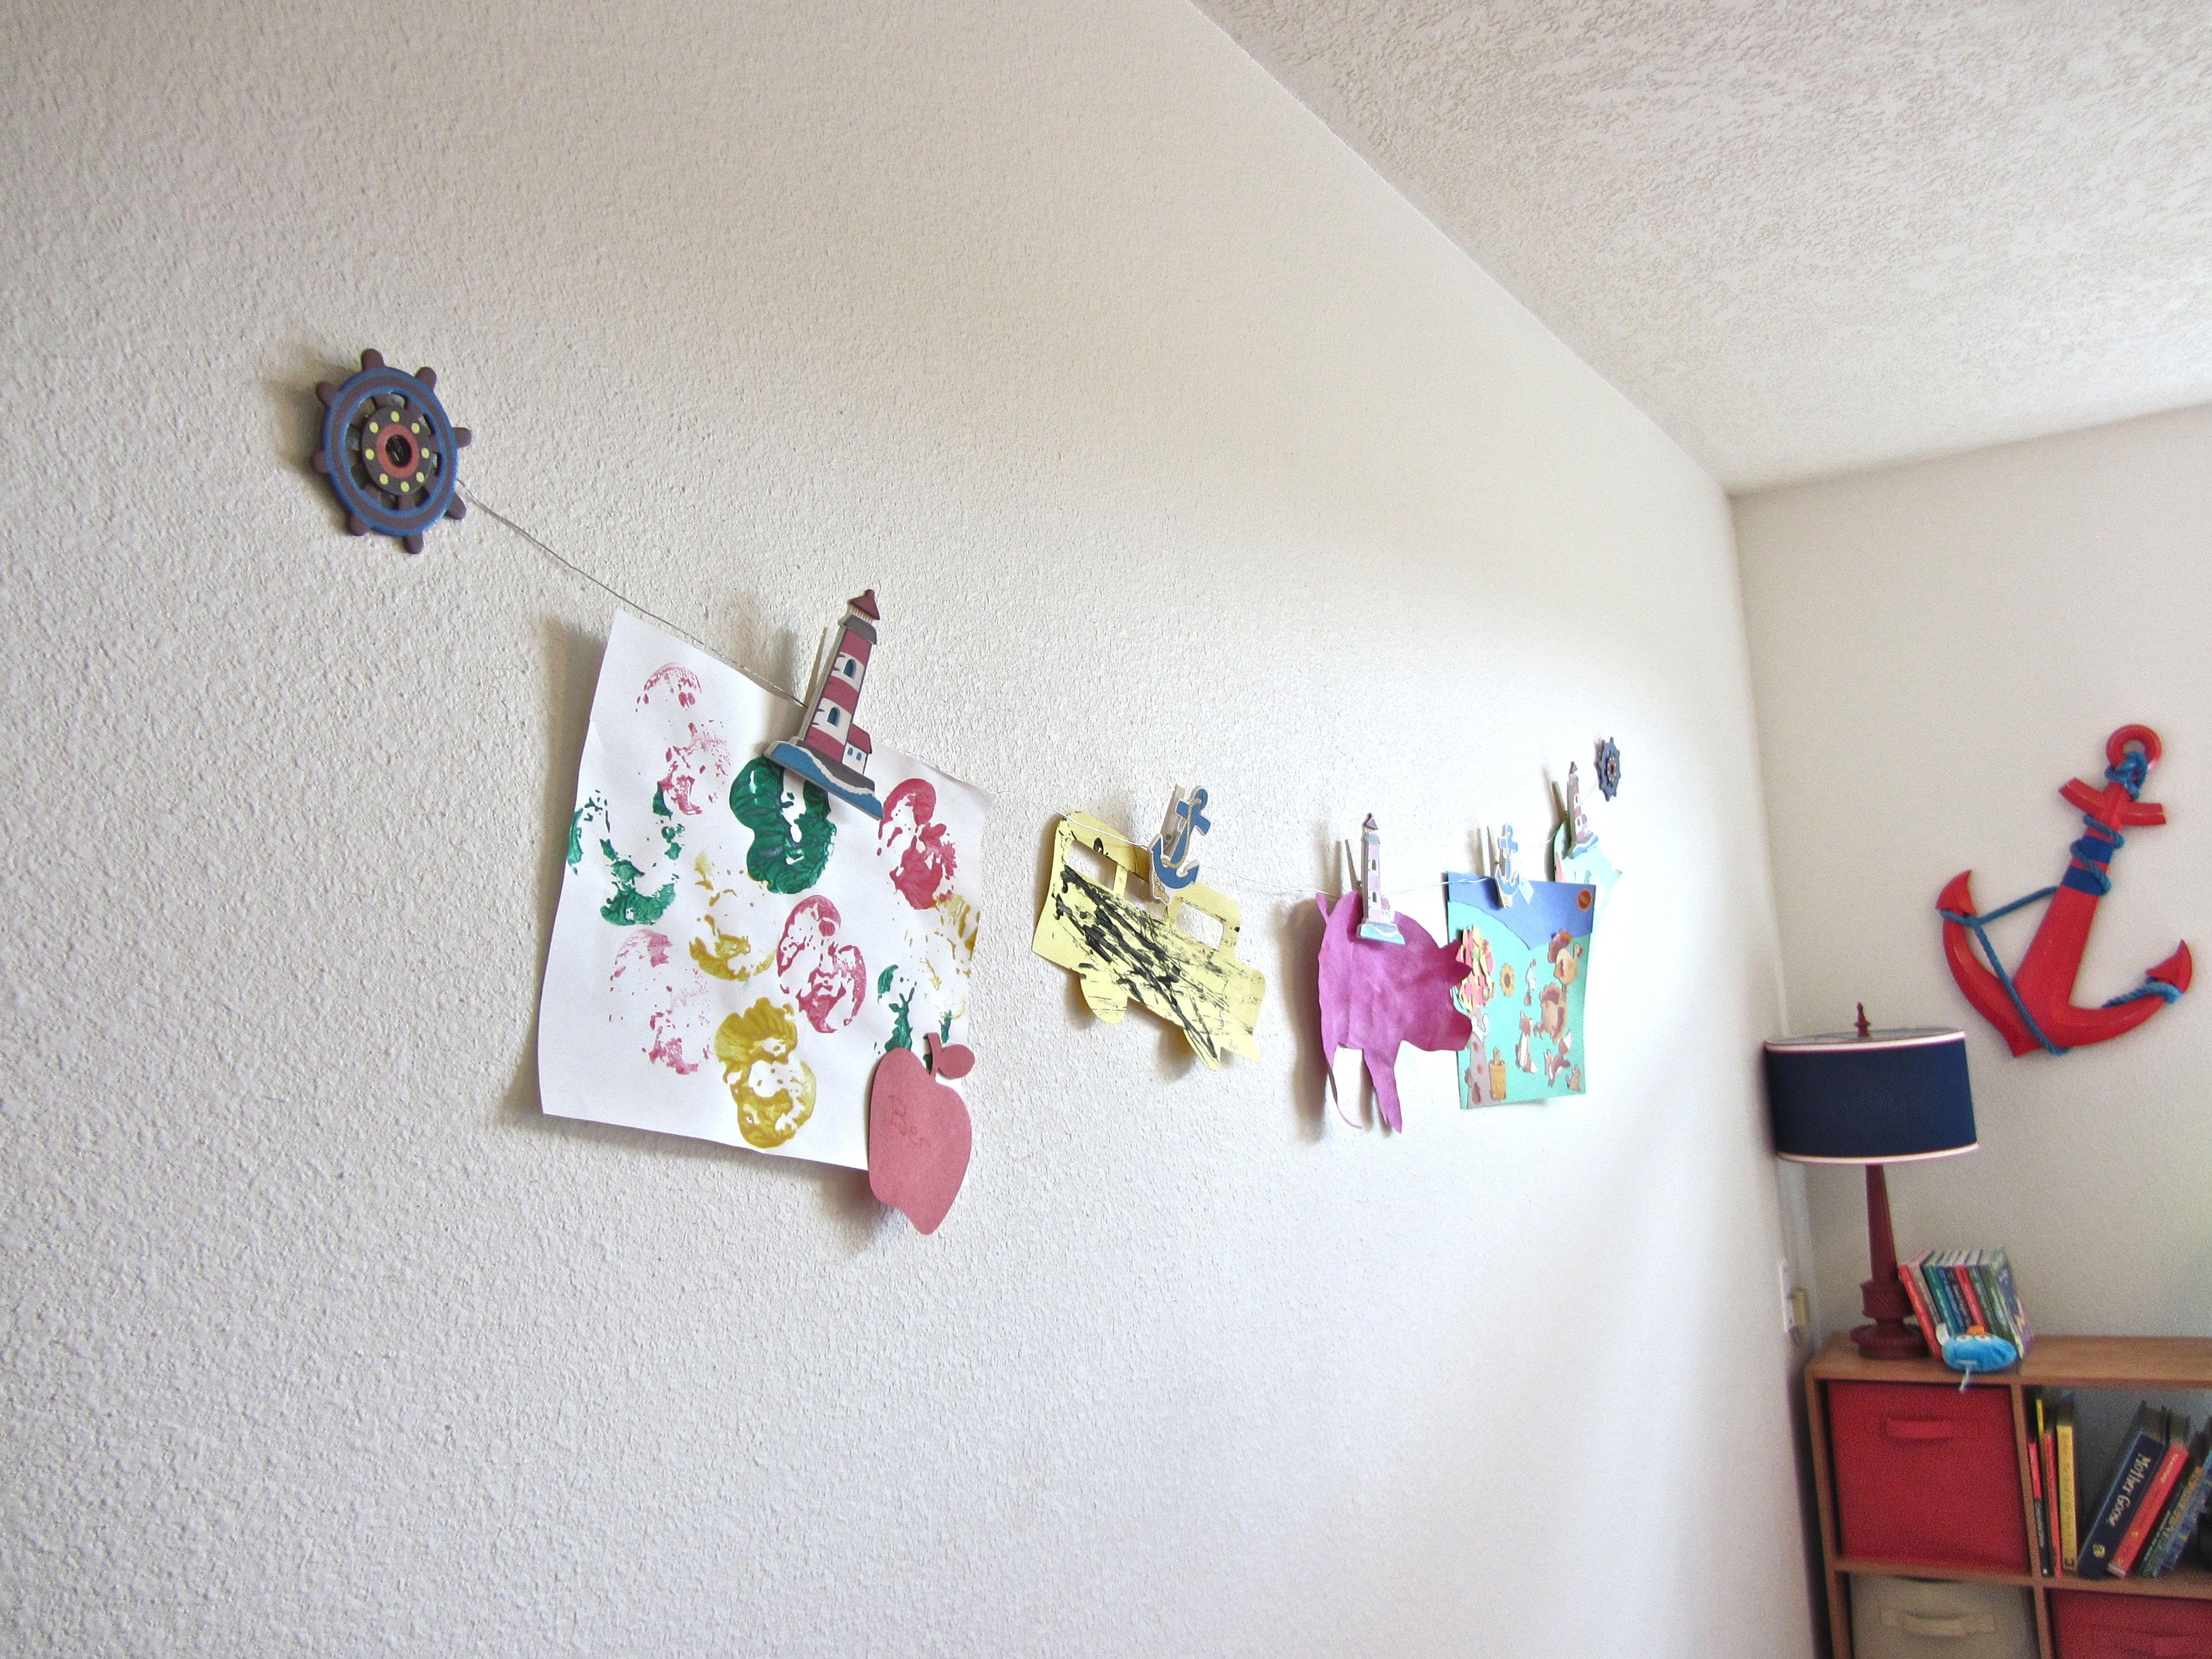 The Kids Clothesline Diy Clothesline Art Display  Pinterest  Display Playrooms And Room